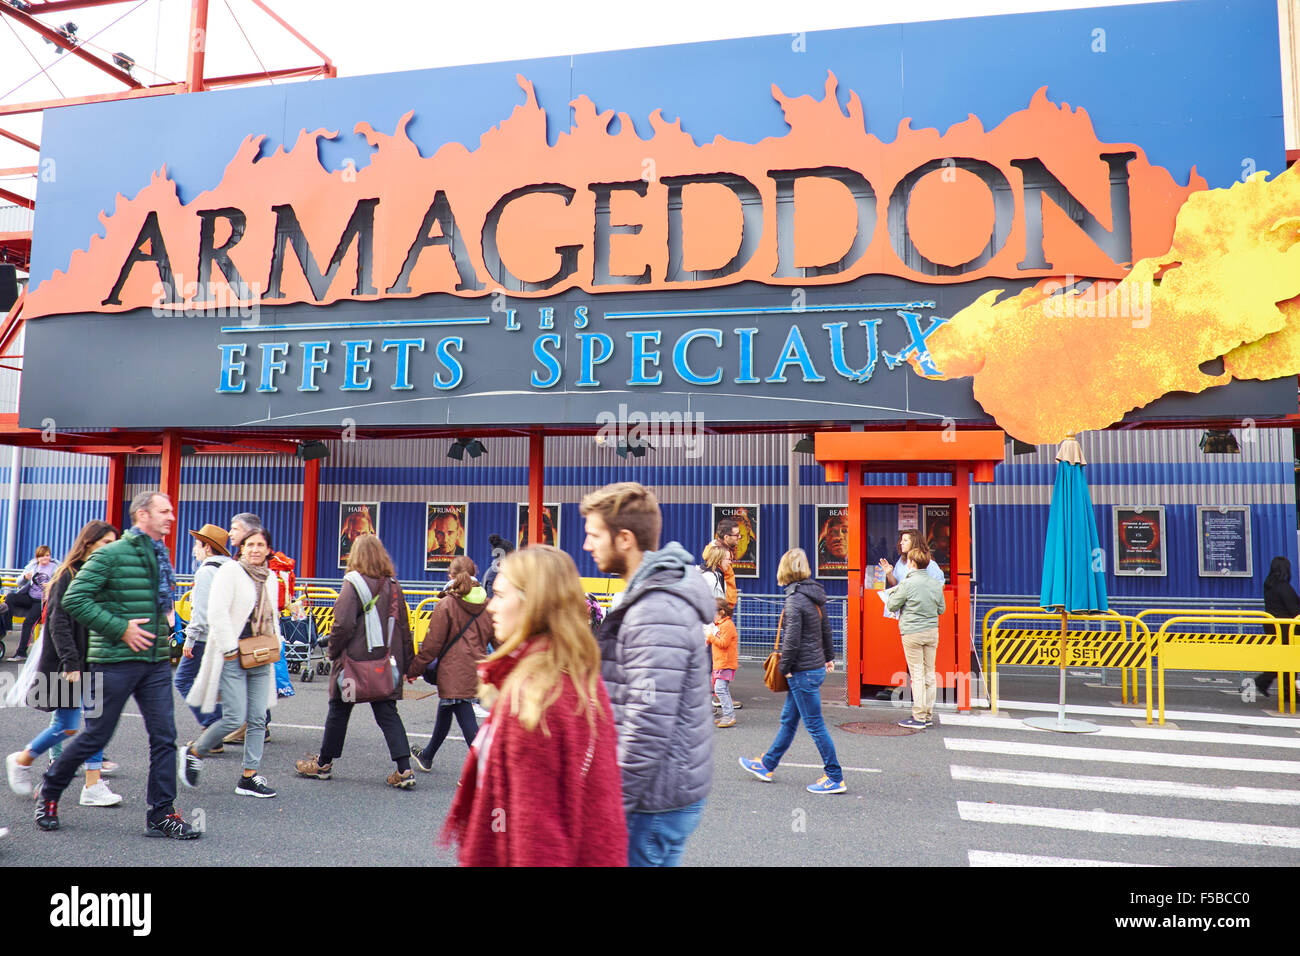 Armageddon Special Effects Attraction Walt Disney Studios Disneyland Paris Marne-la-Vallee Chessy France - Stock Image